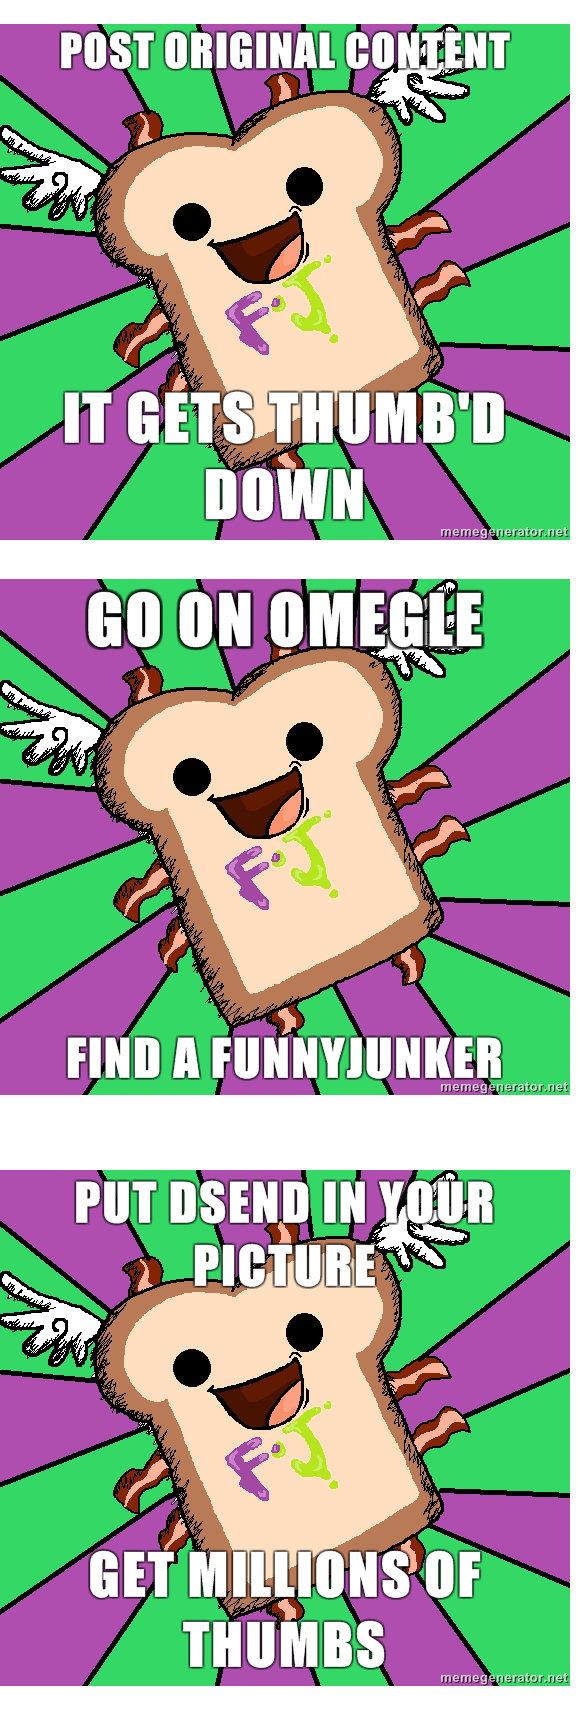 Funnyjunk Meme : Funnyjunk meme